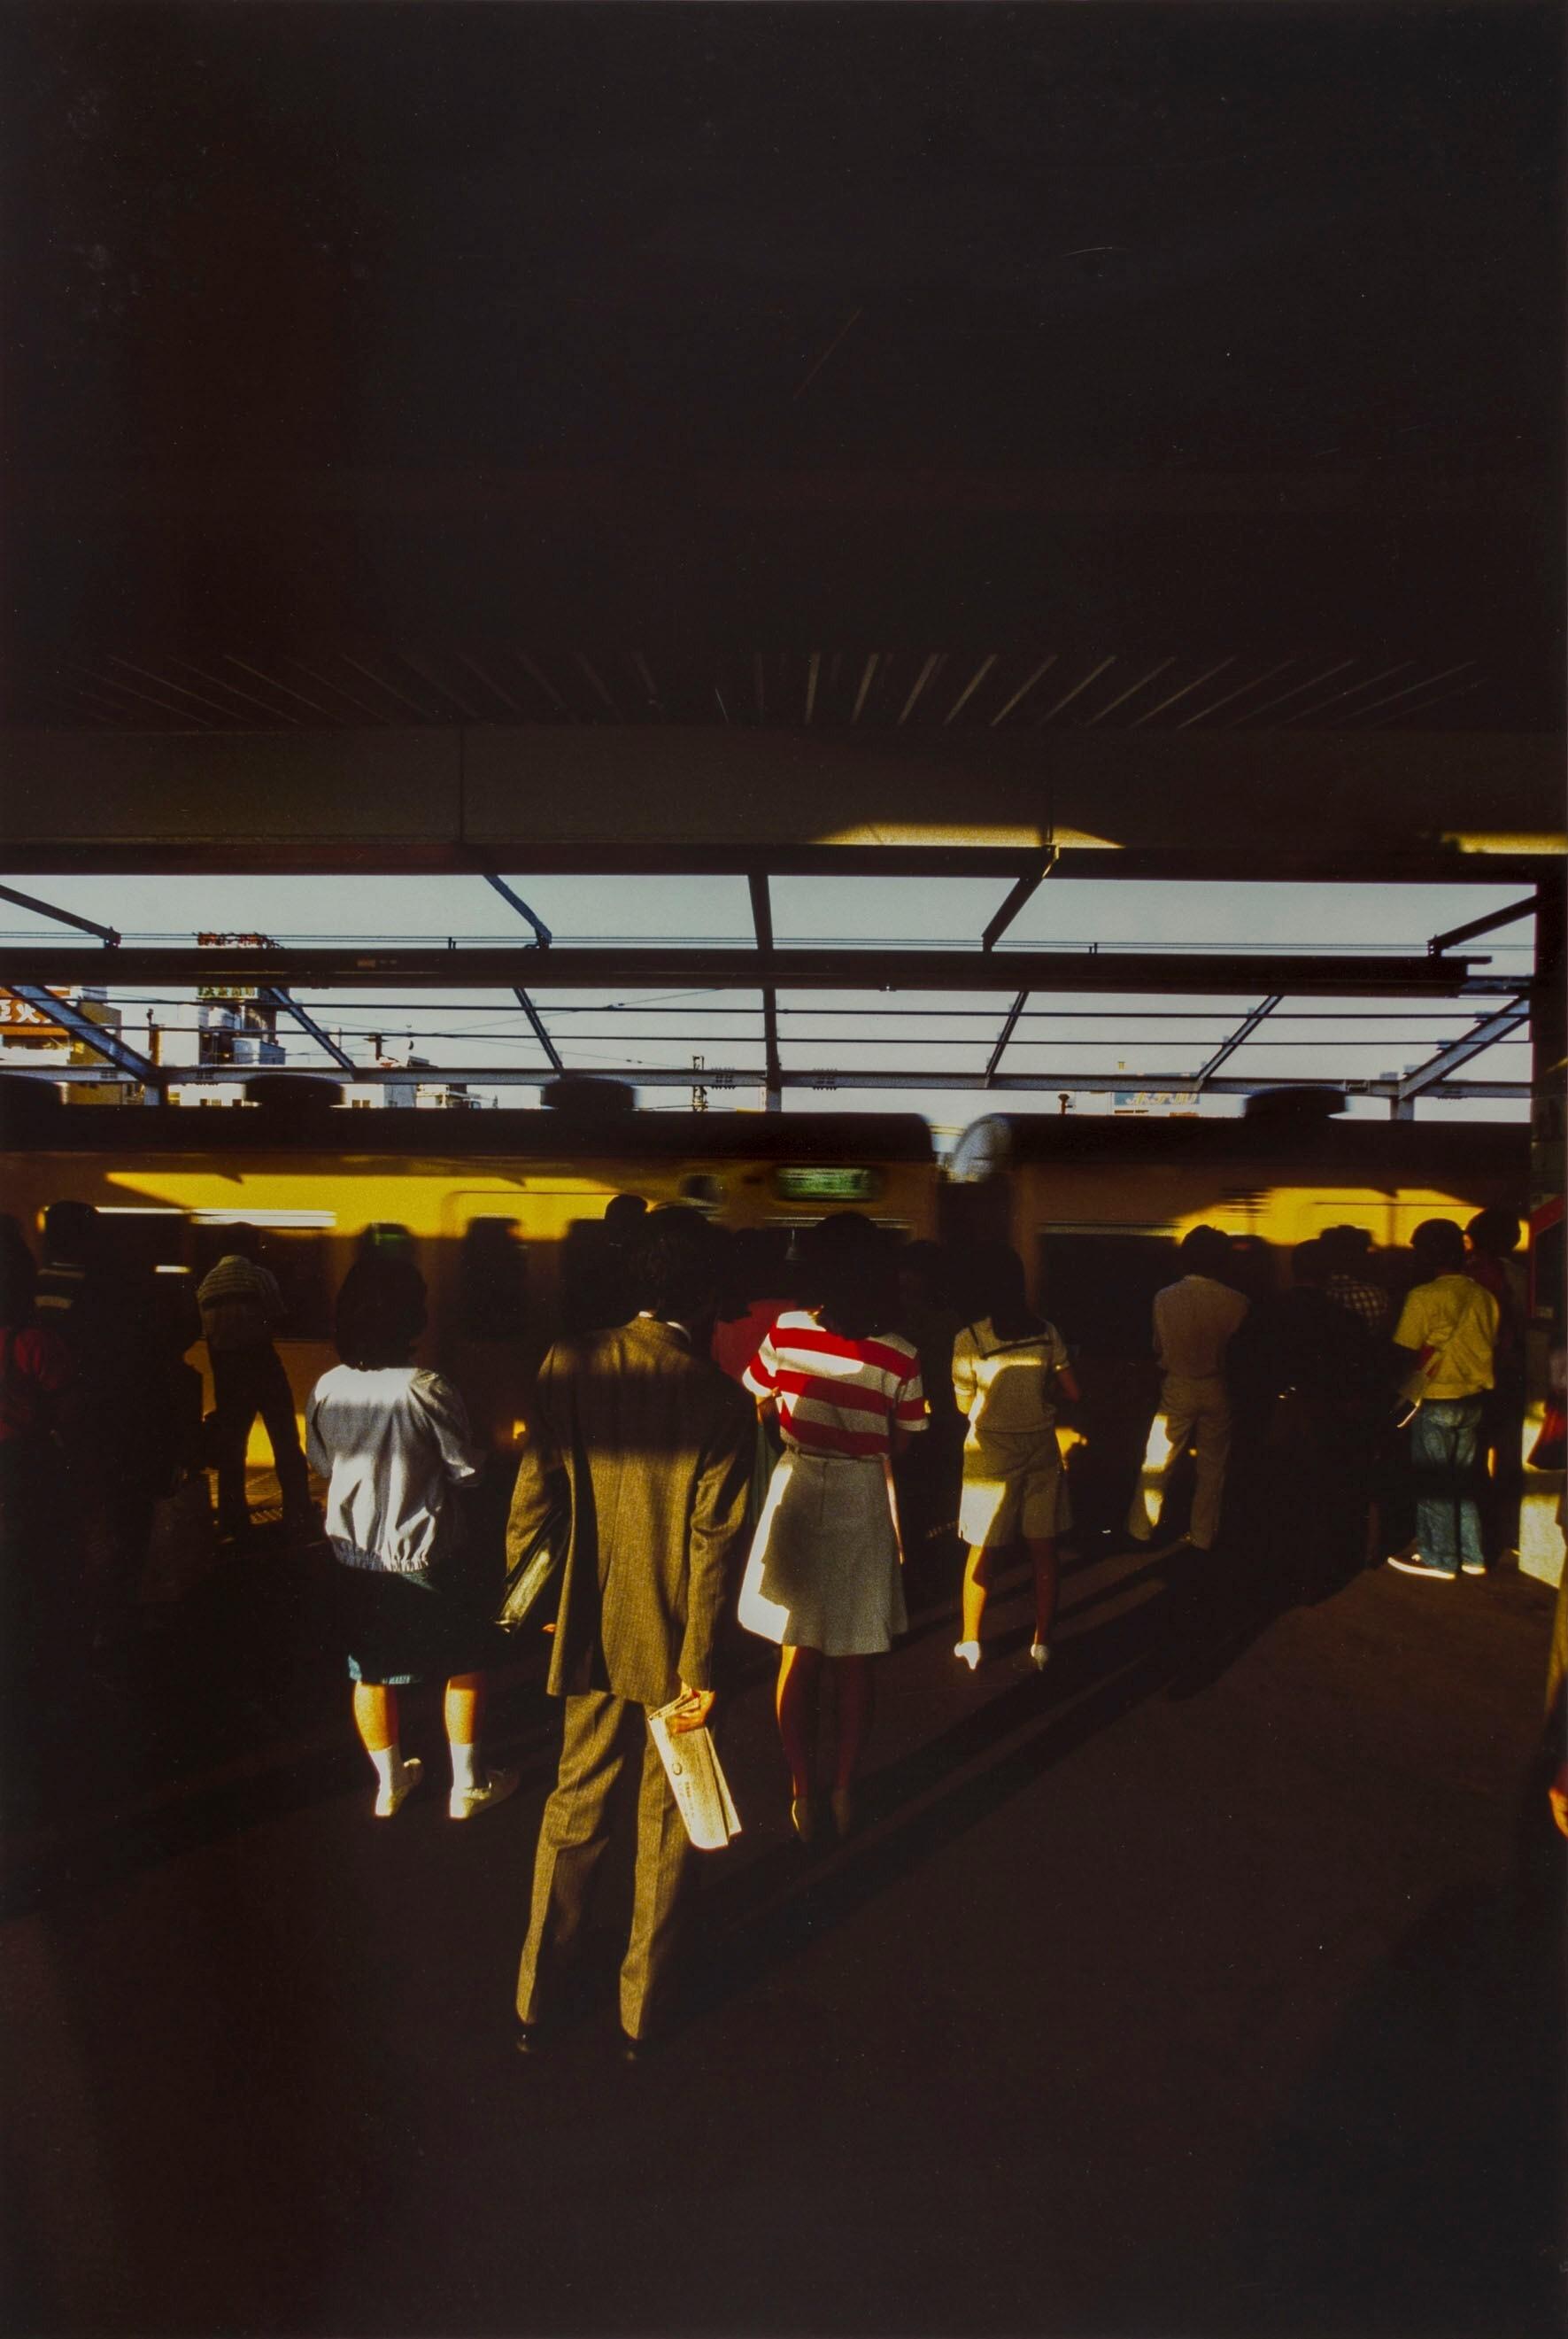 Город, 1983. Фотограф Франко Фонтана